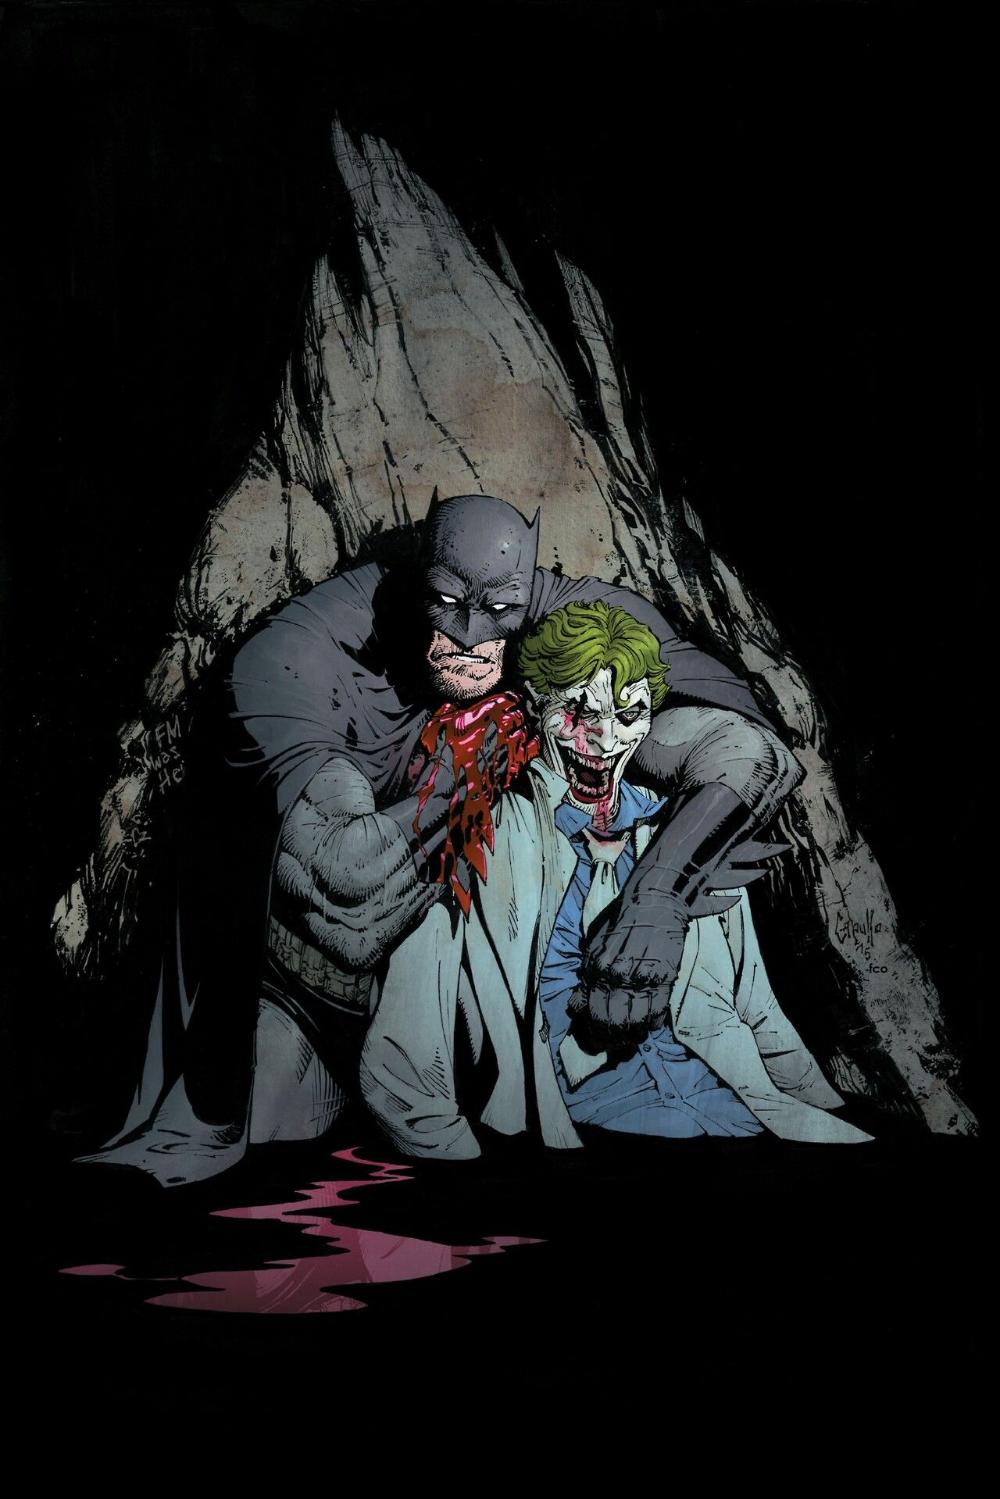 The Dark Knight Returns hd wallpaper - Google Search ...